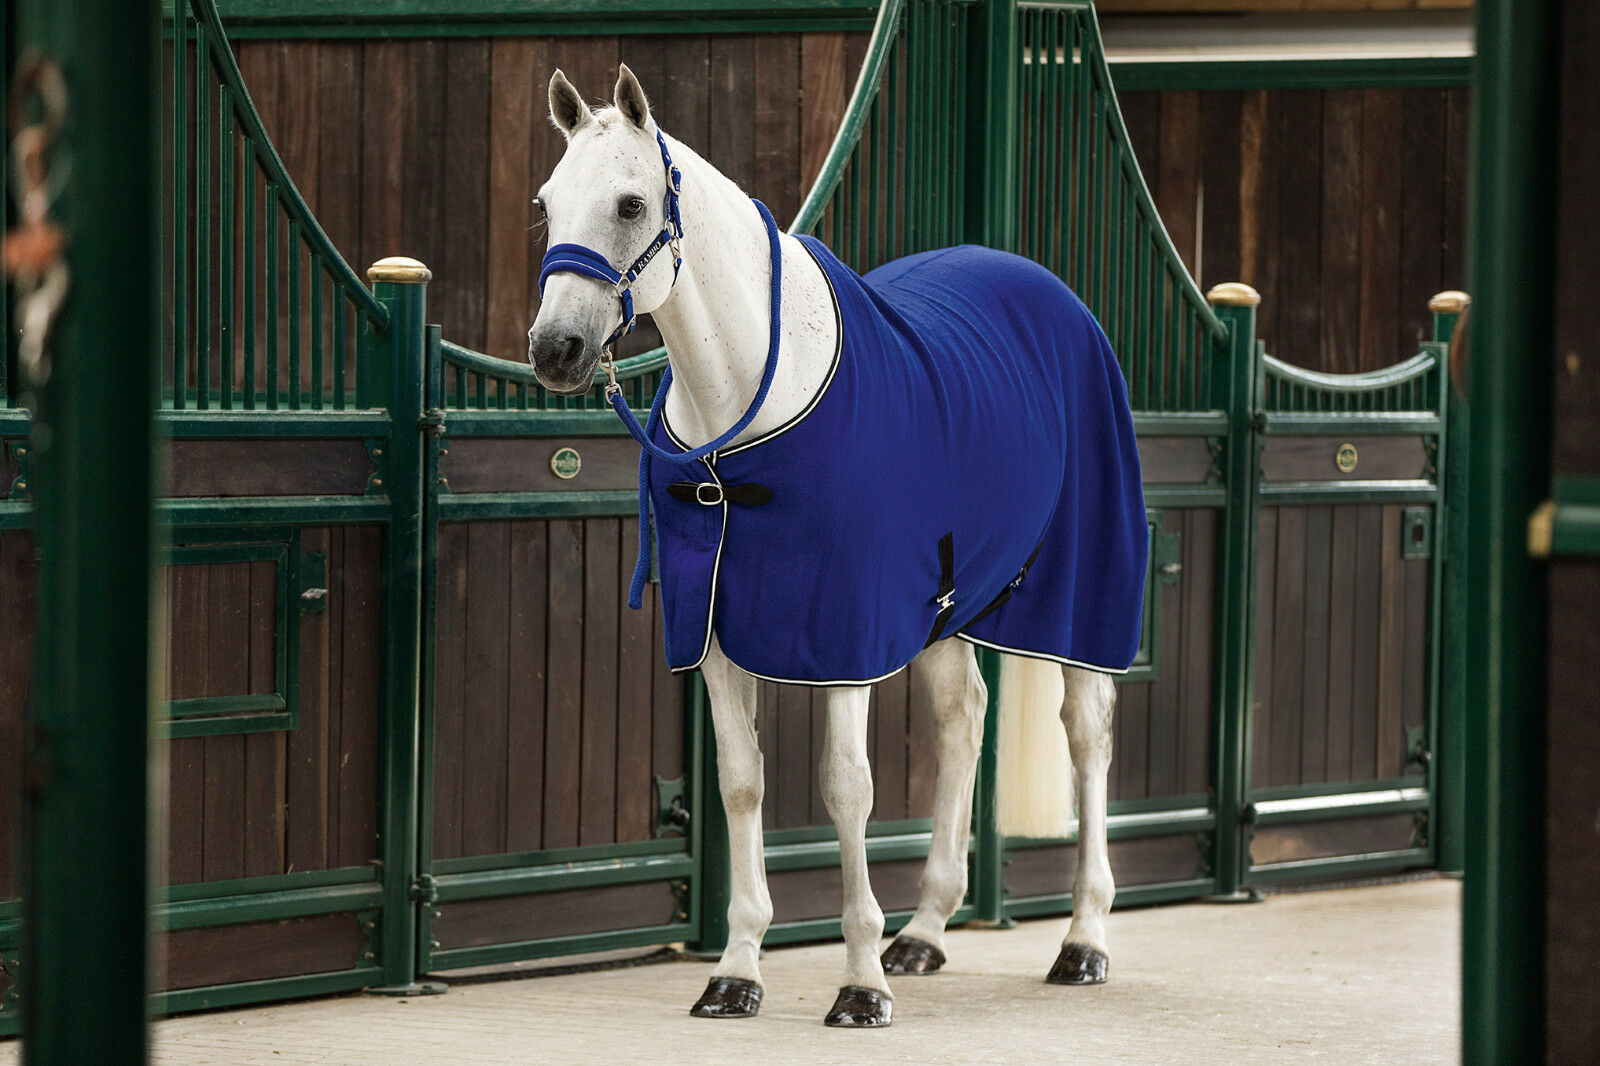 Horseware Rambo WOOL RUG Cooler Stable/Travel/Layer Sheet Royal Blau 5'0